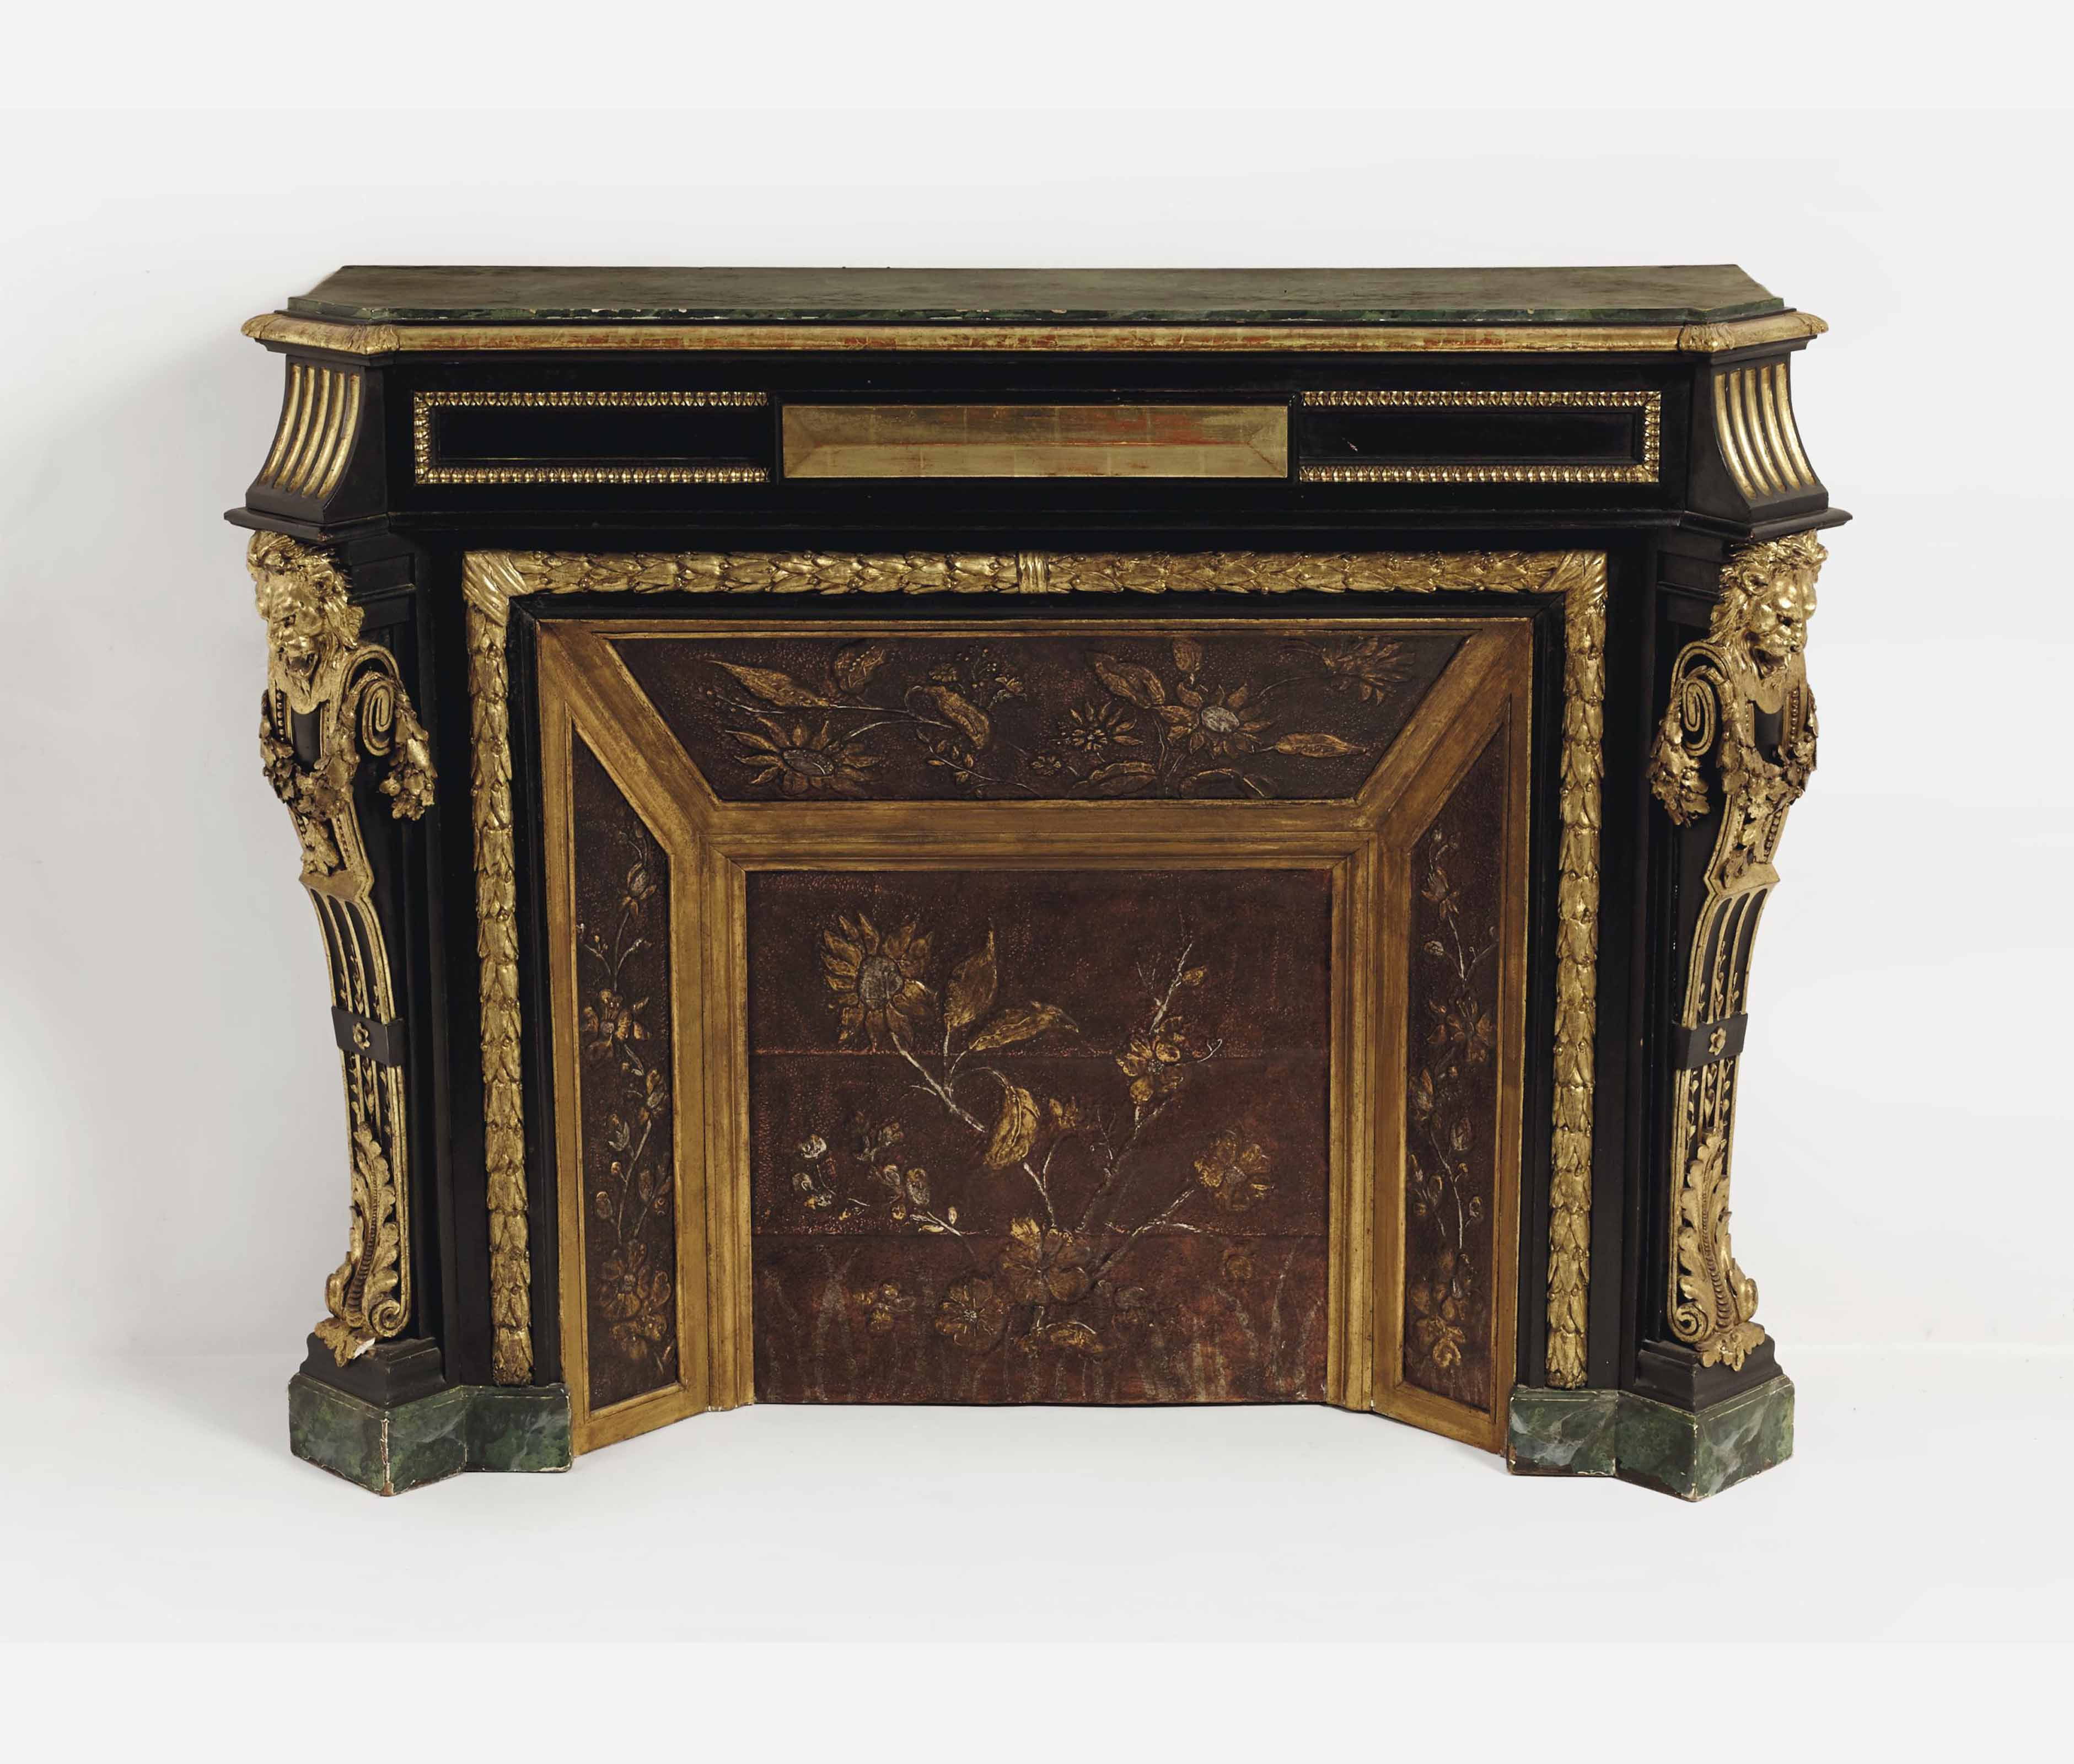 console a l 39 imitation d 39 une cheminee de style napoleon iii christie 39 s. Black Bedroom Furniture Sets. Home Design Ideas